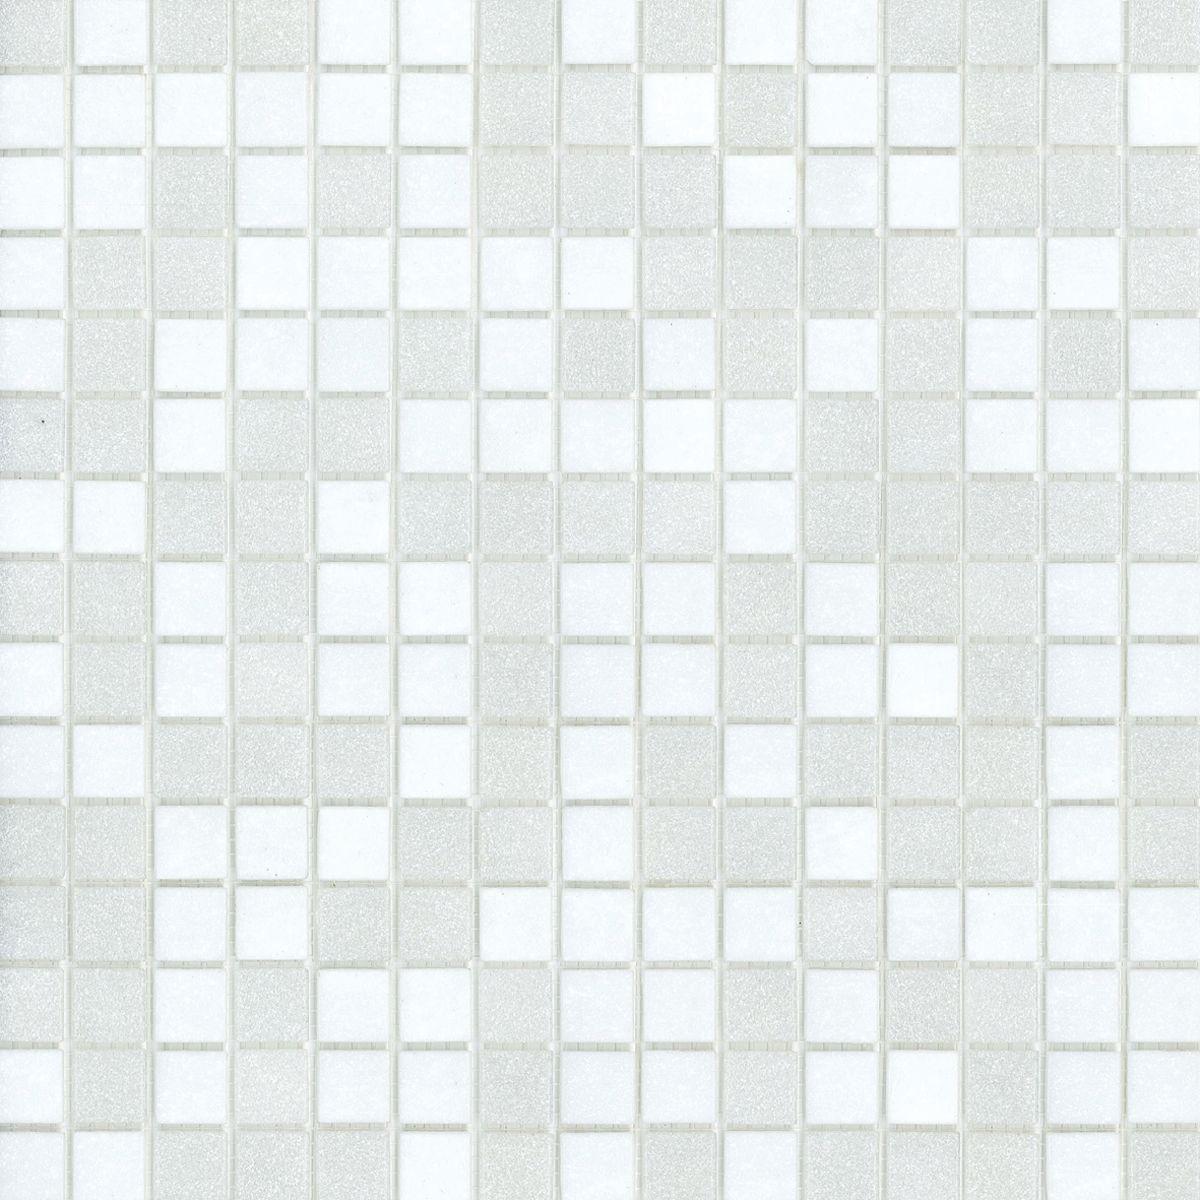 Piastrelle bagno mosaico leroy merlin interesting for Mosaico leroy merlin